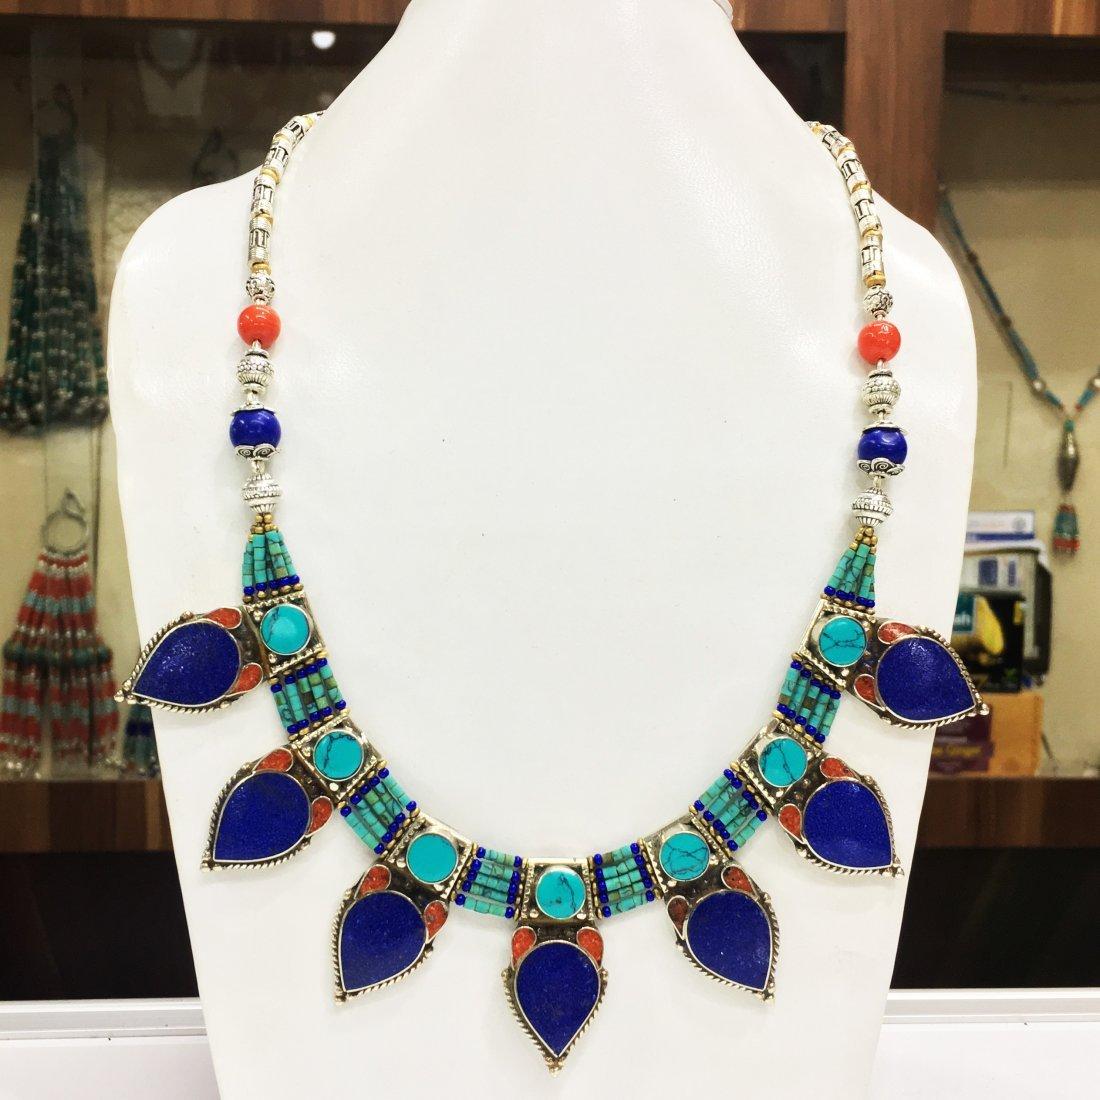 Nepalese Handmade Turquoise Necklace